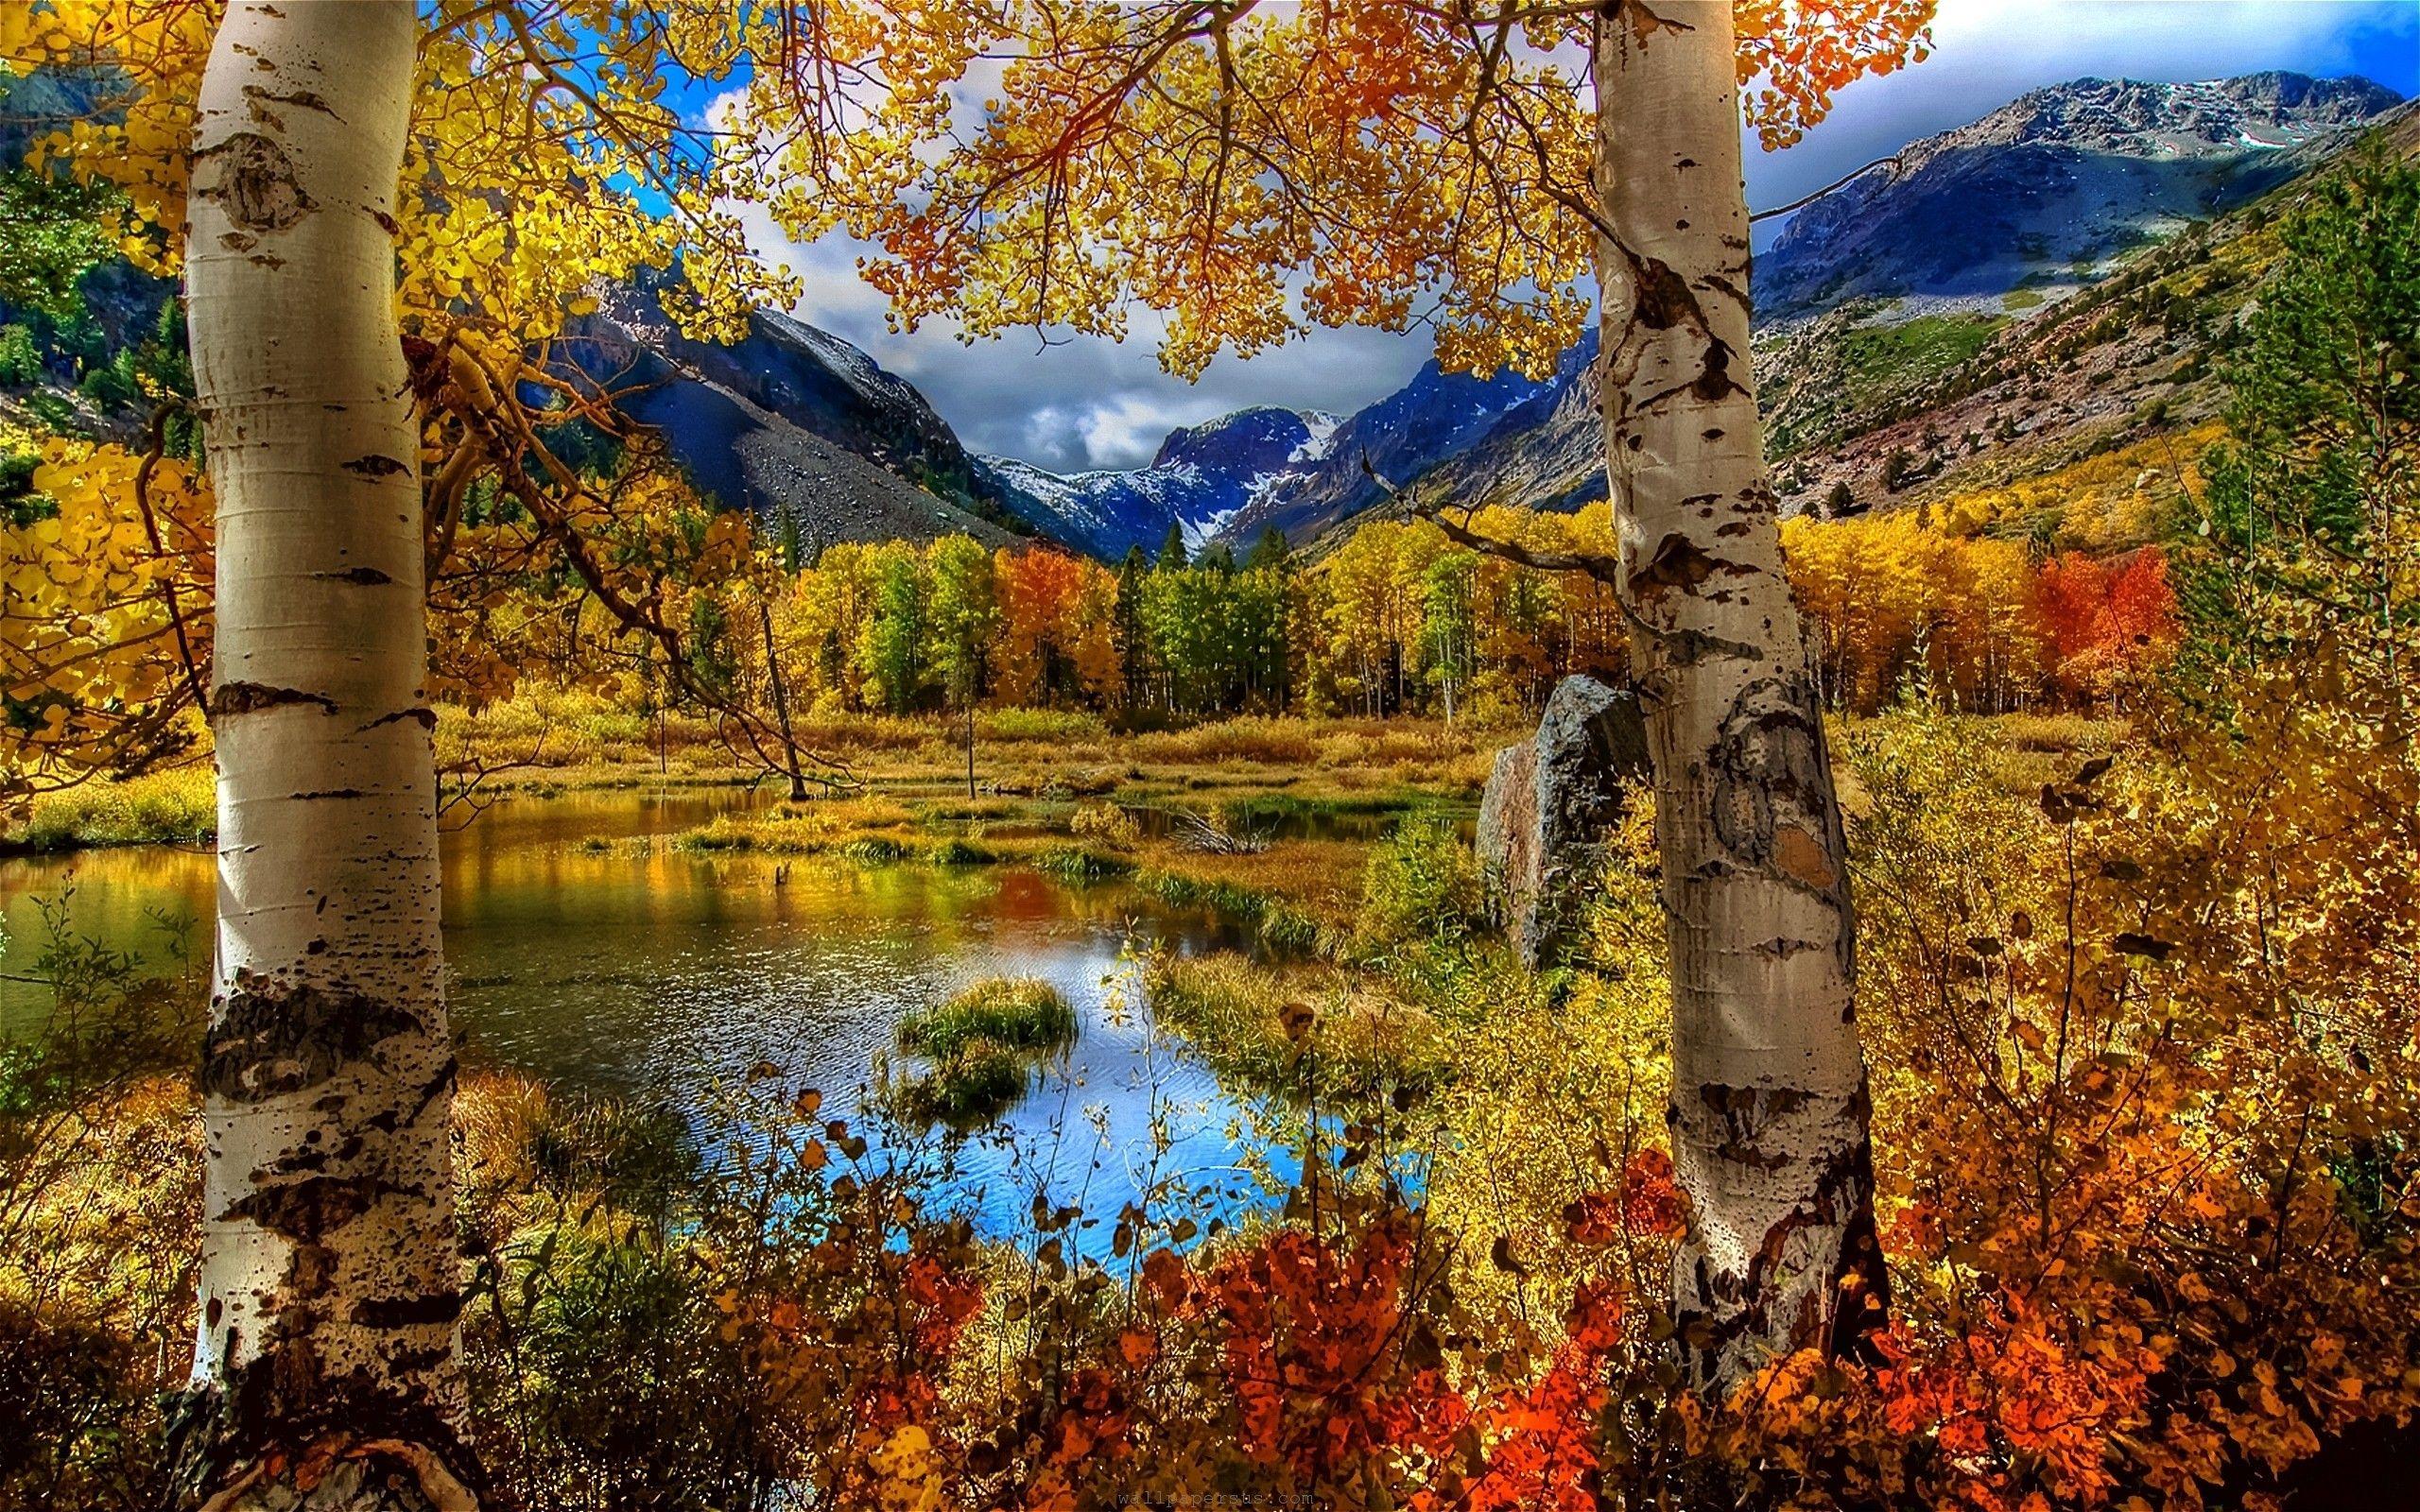 Landscapes Google Search Autumn Landscape Scenery Wallpaper Autumn Scenery